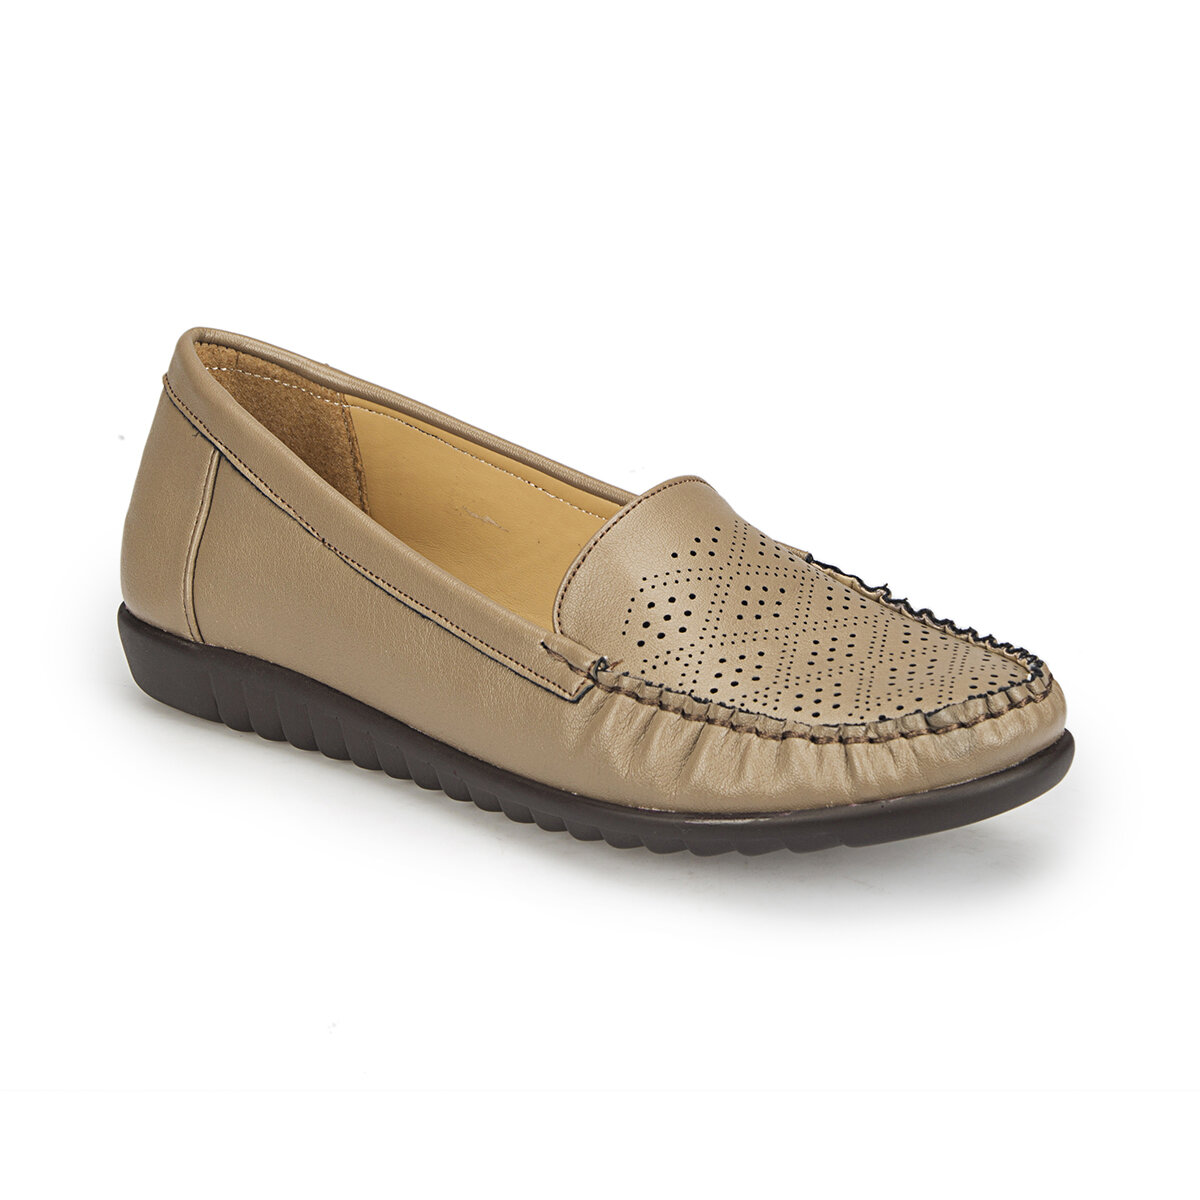 FLO 81. 158459.Z Mink Women Basic Comfort Polaris